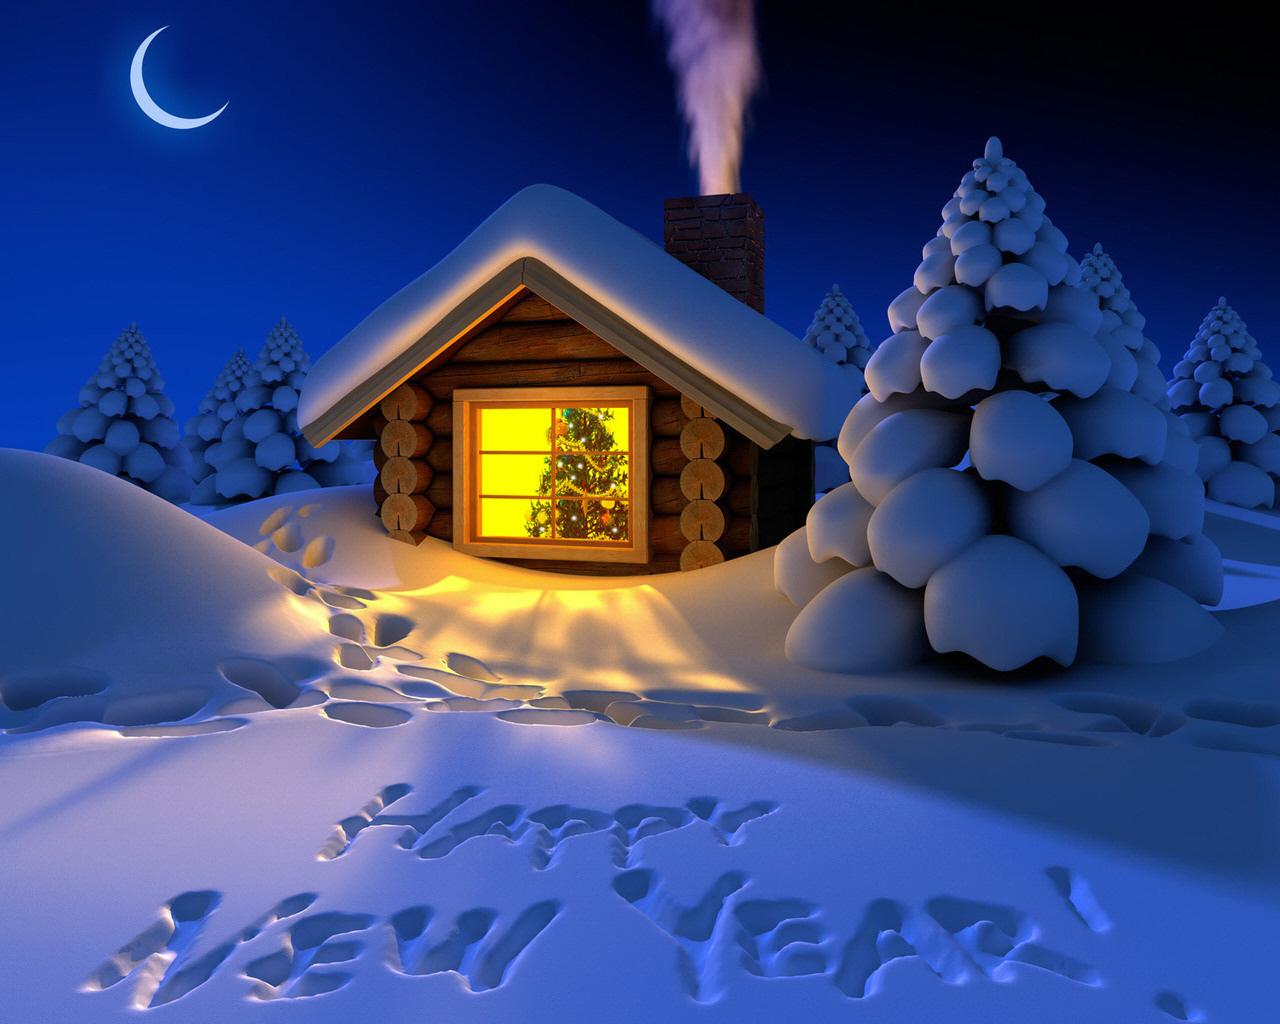 Best Desktop HD Wallpaper   Happy New Year Photo Desktop Wallpapers 1280x1024